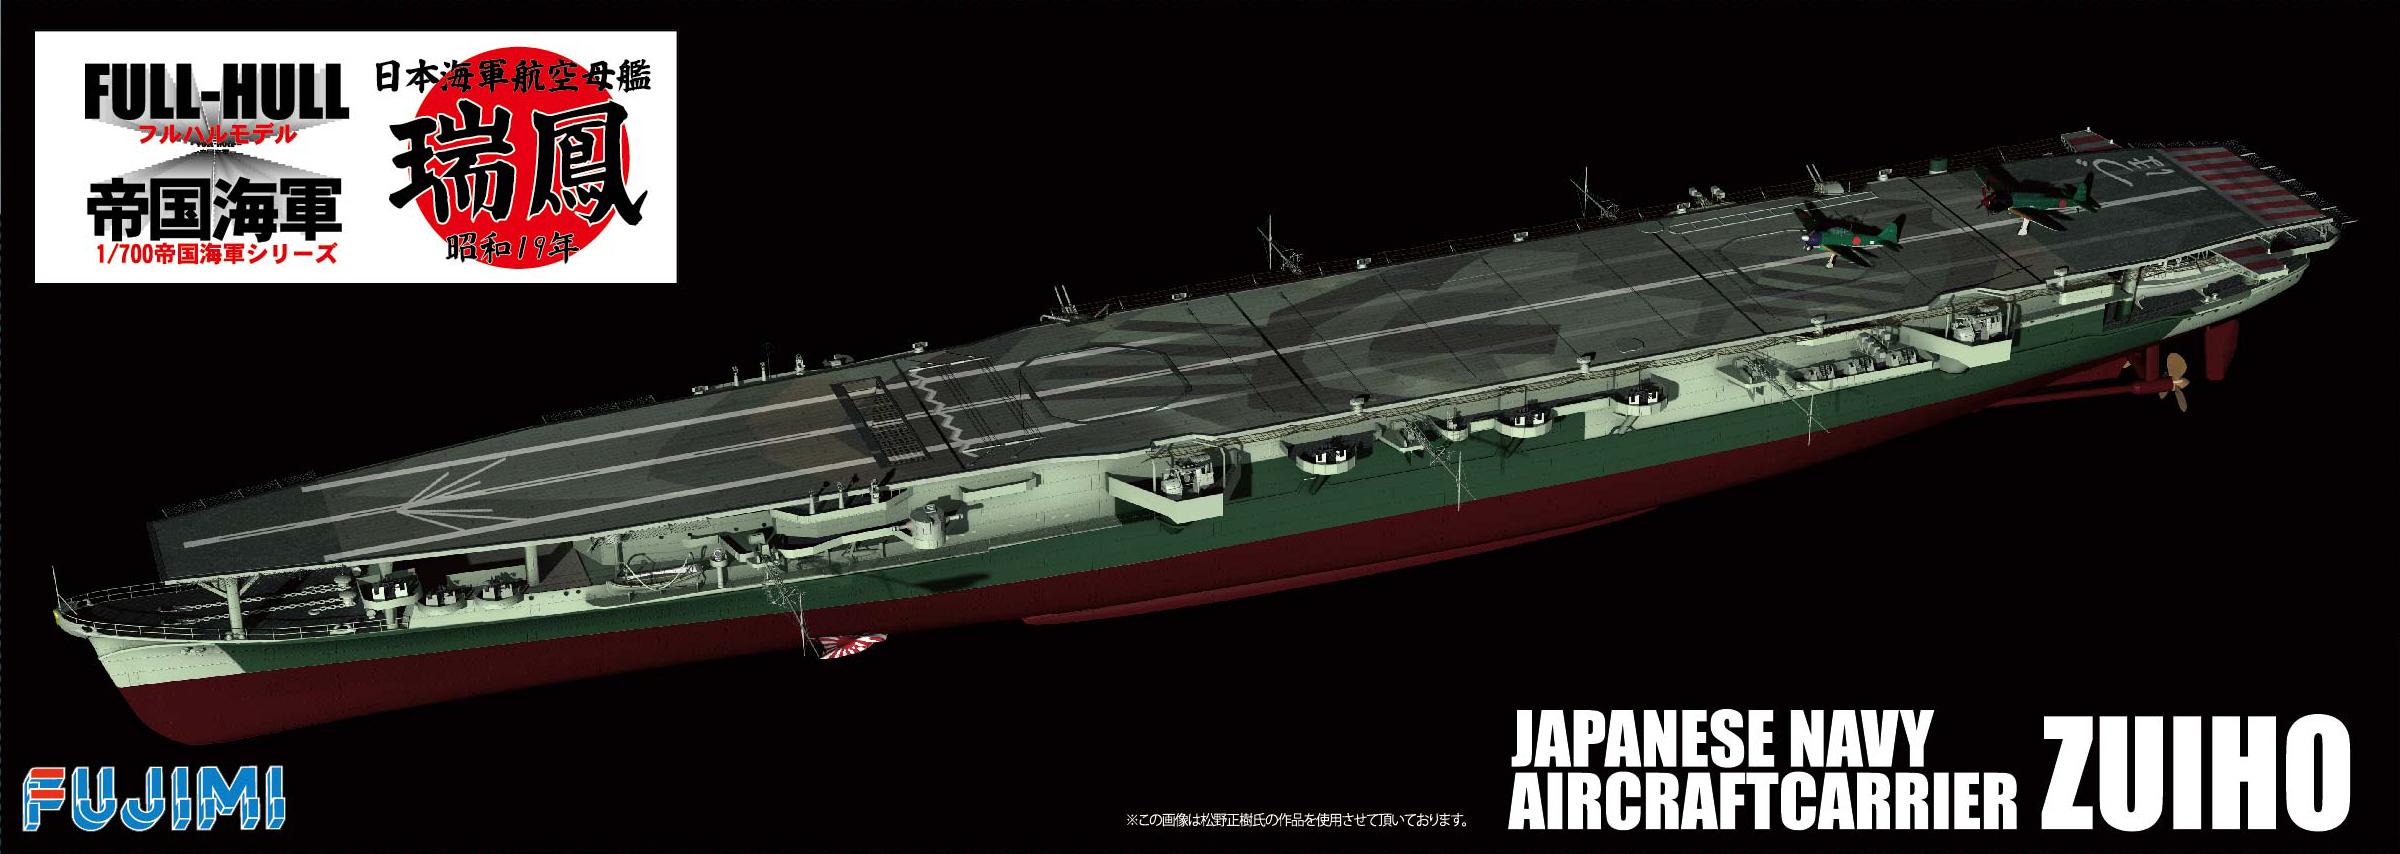 Fujimi IJN Aircraft Carrier Zuiho Full Hull